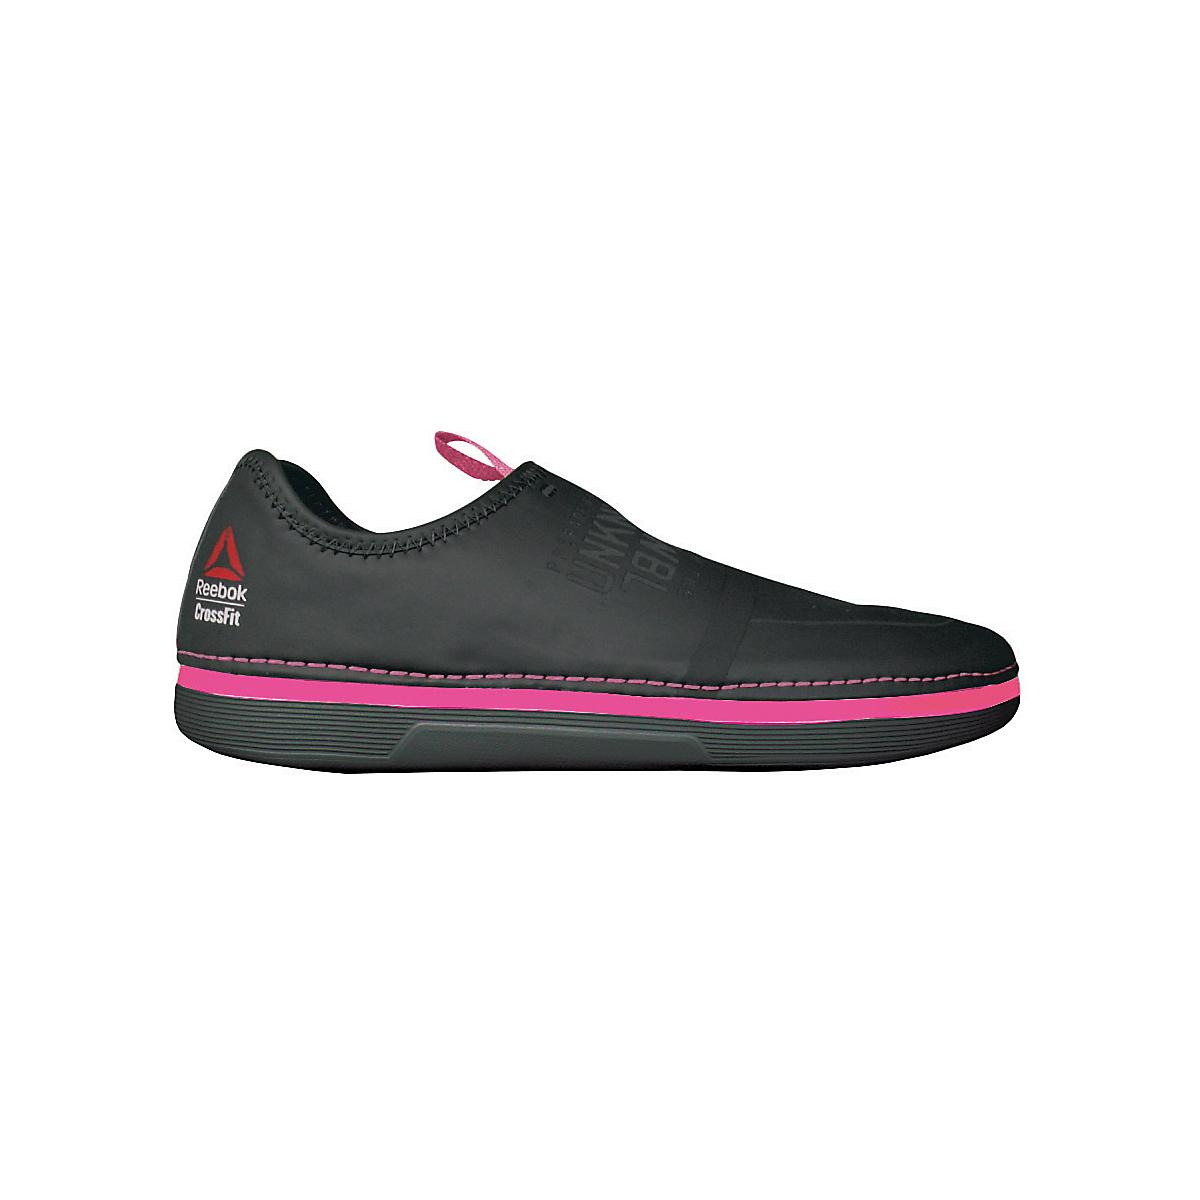 4b9b1bac8a7a Womens Reebok CrossFit Nanossage TR Casual Shoe at Road Runner Sports